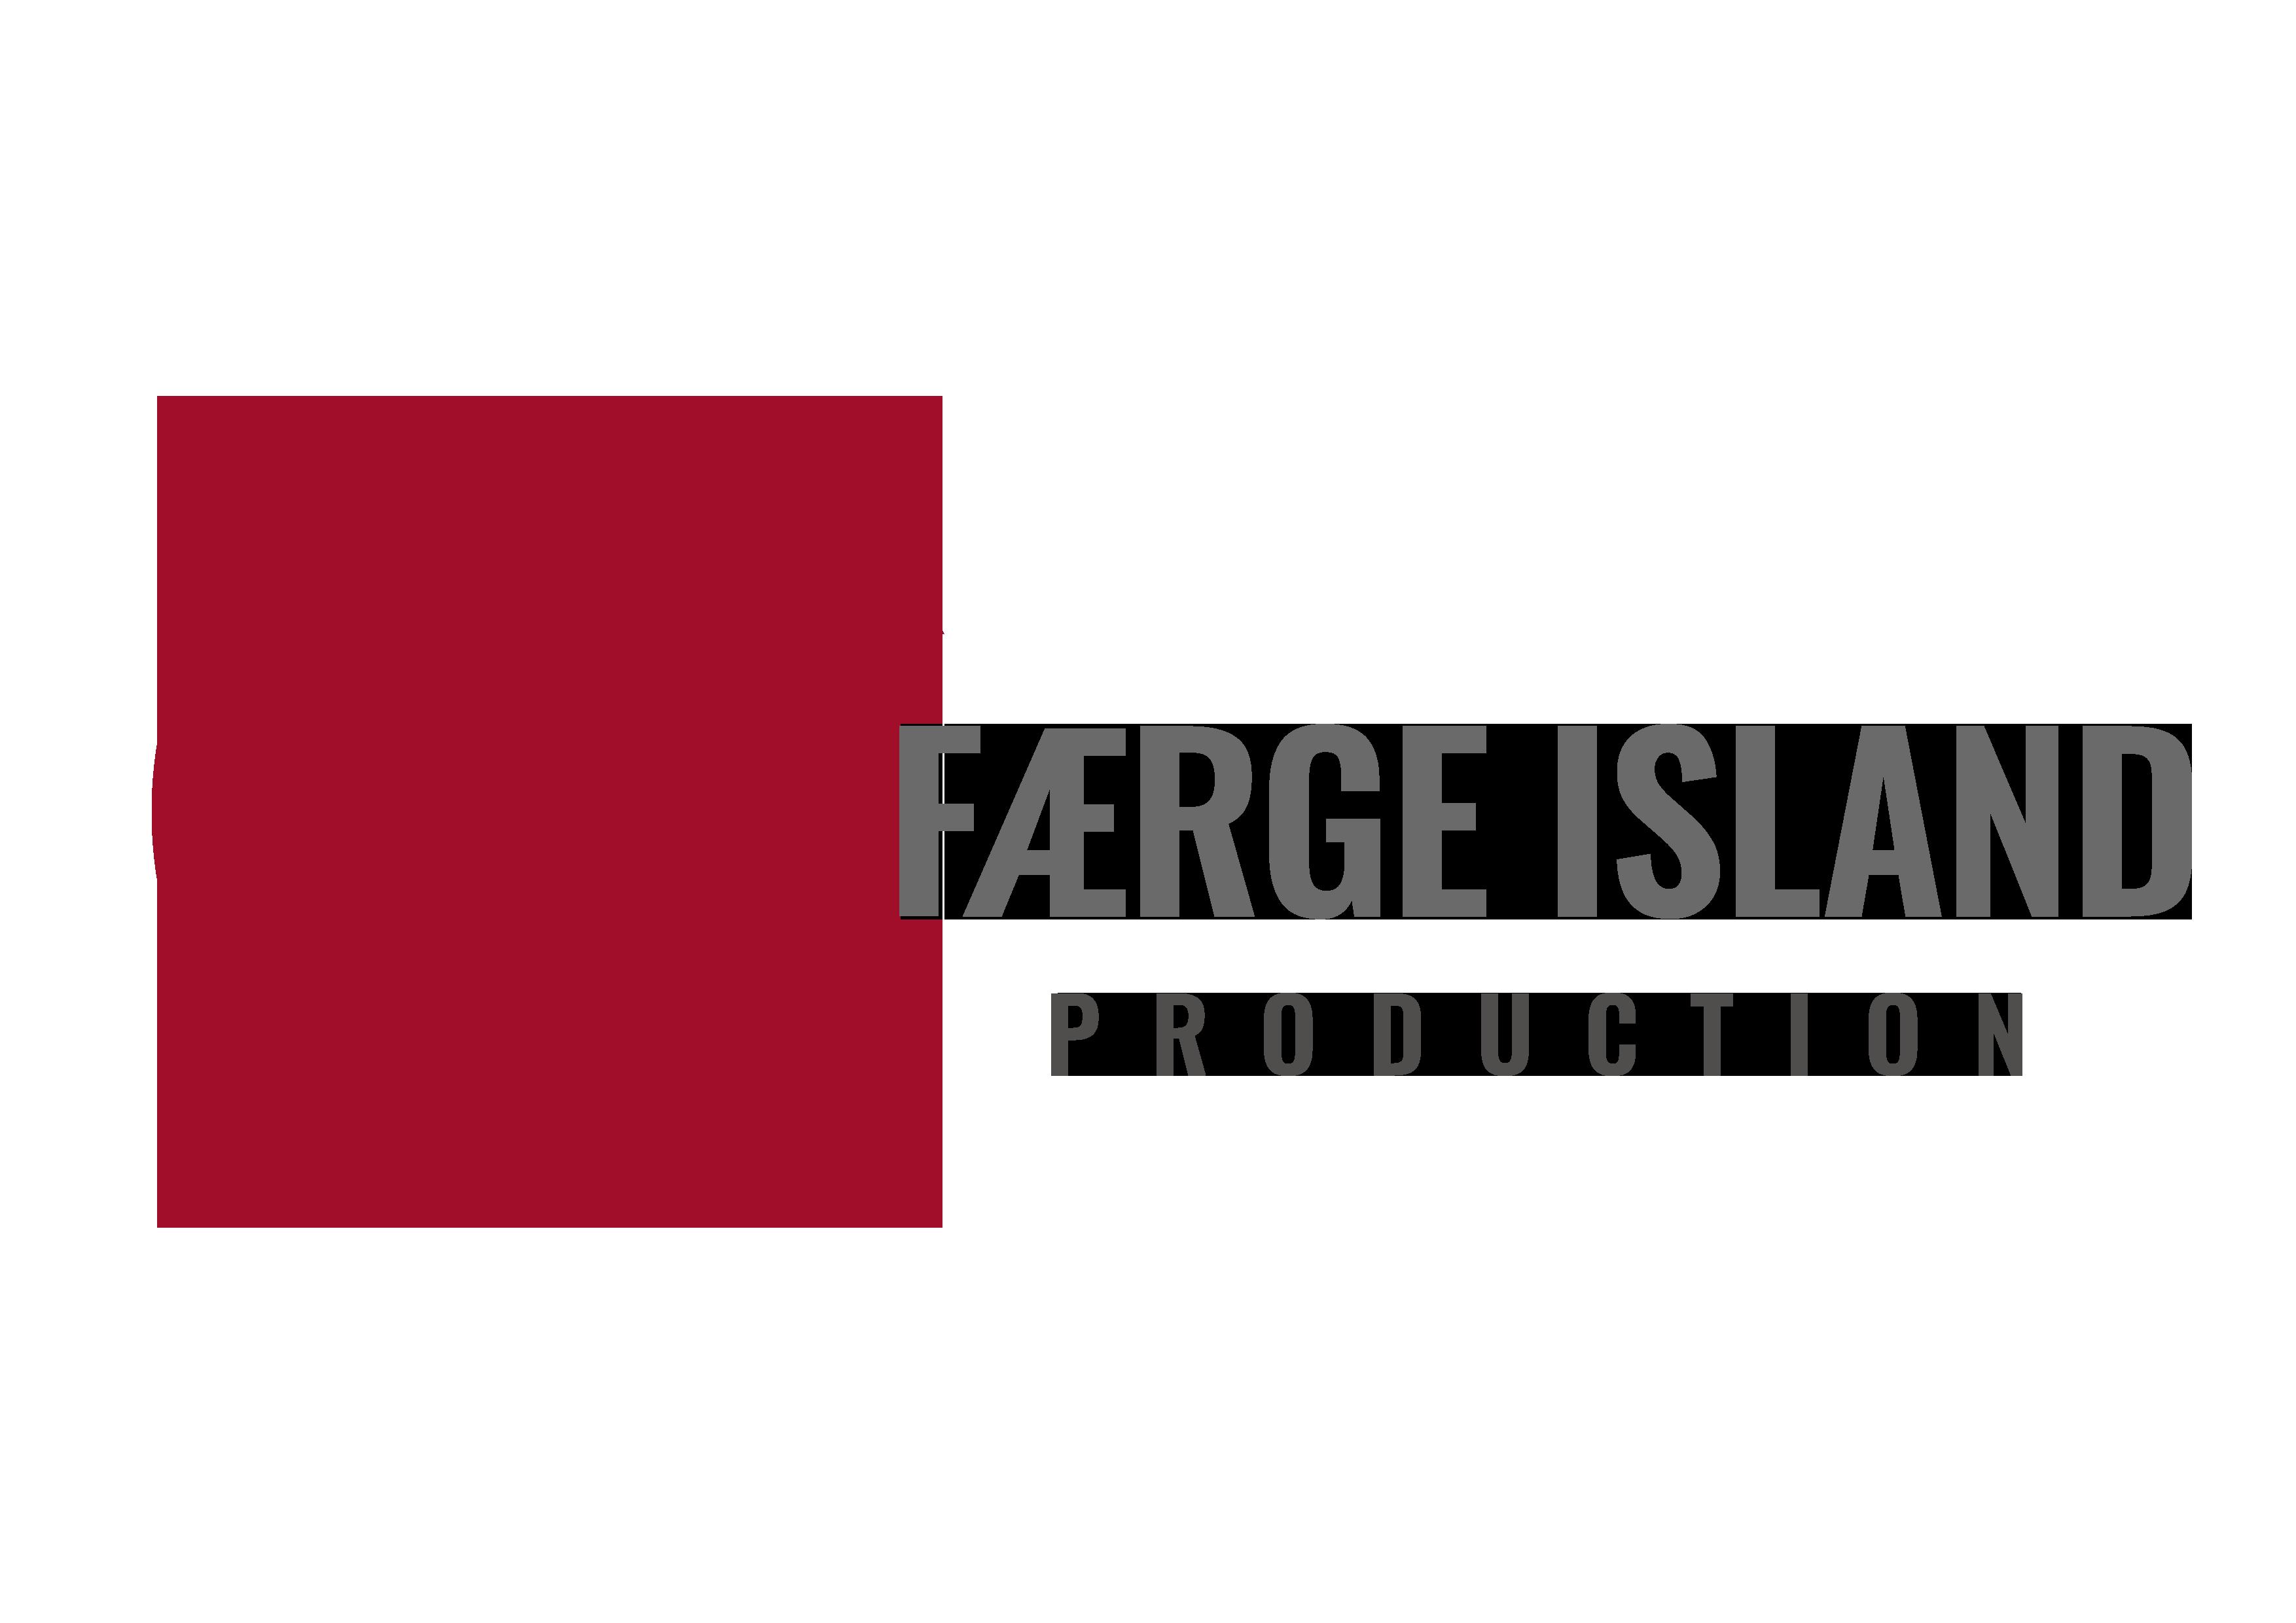 fC3A6rge-island-tunnus.png (117 KB)